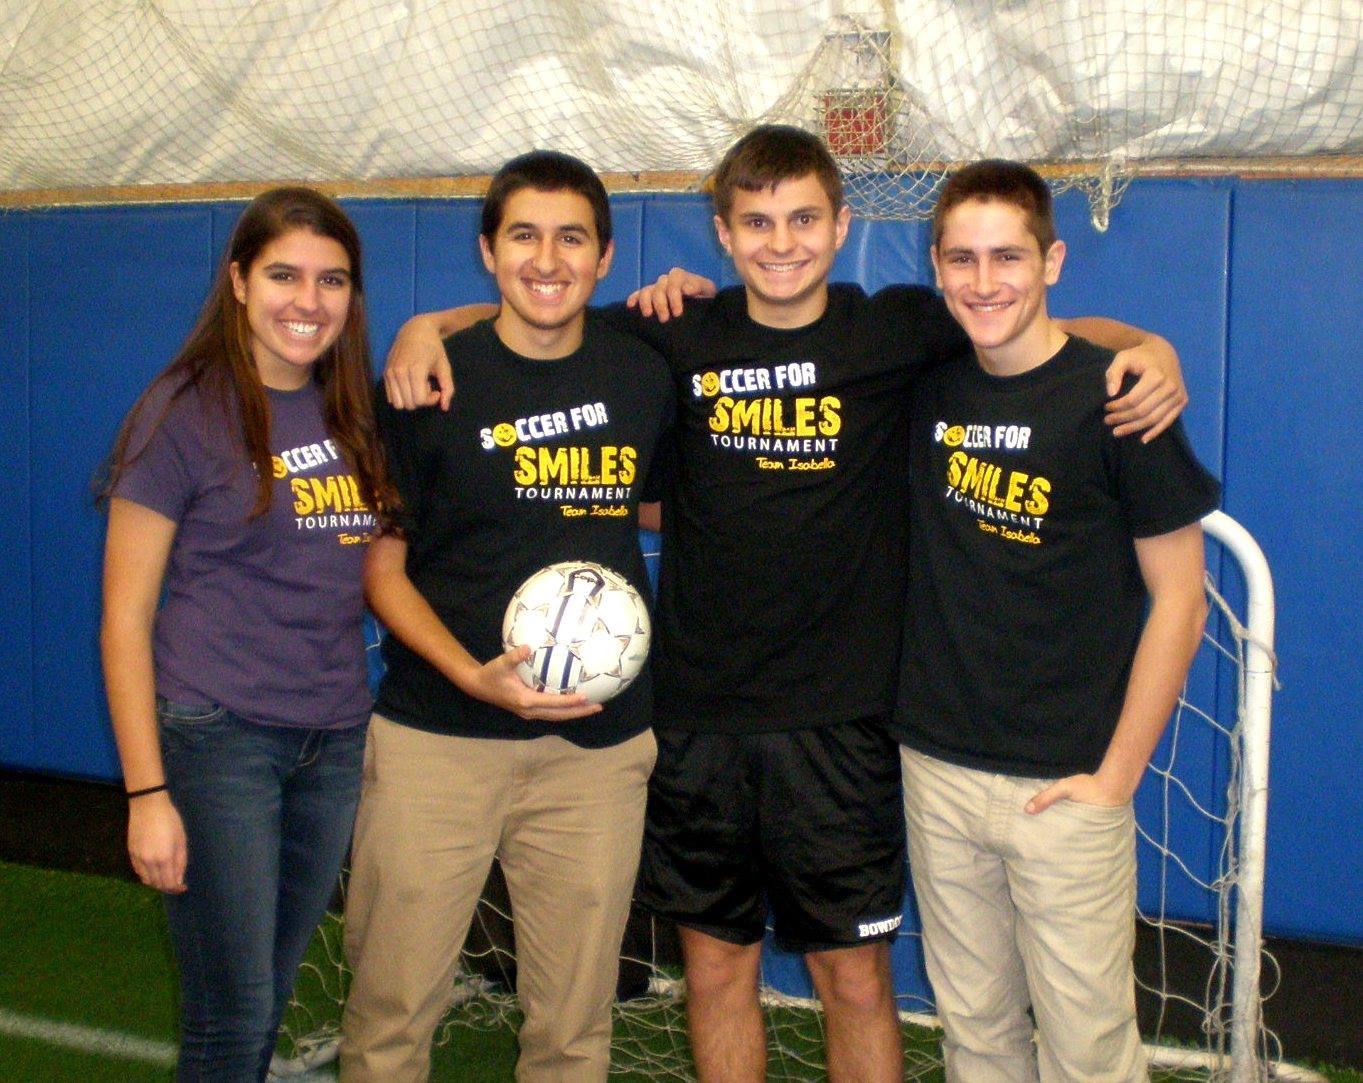 Cobi Frongillo and Friends Soccer for Smiles